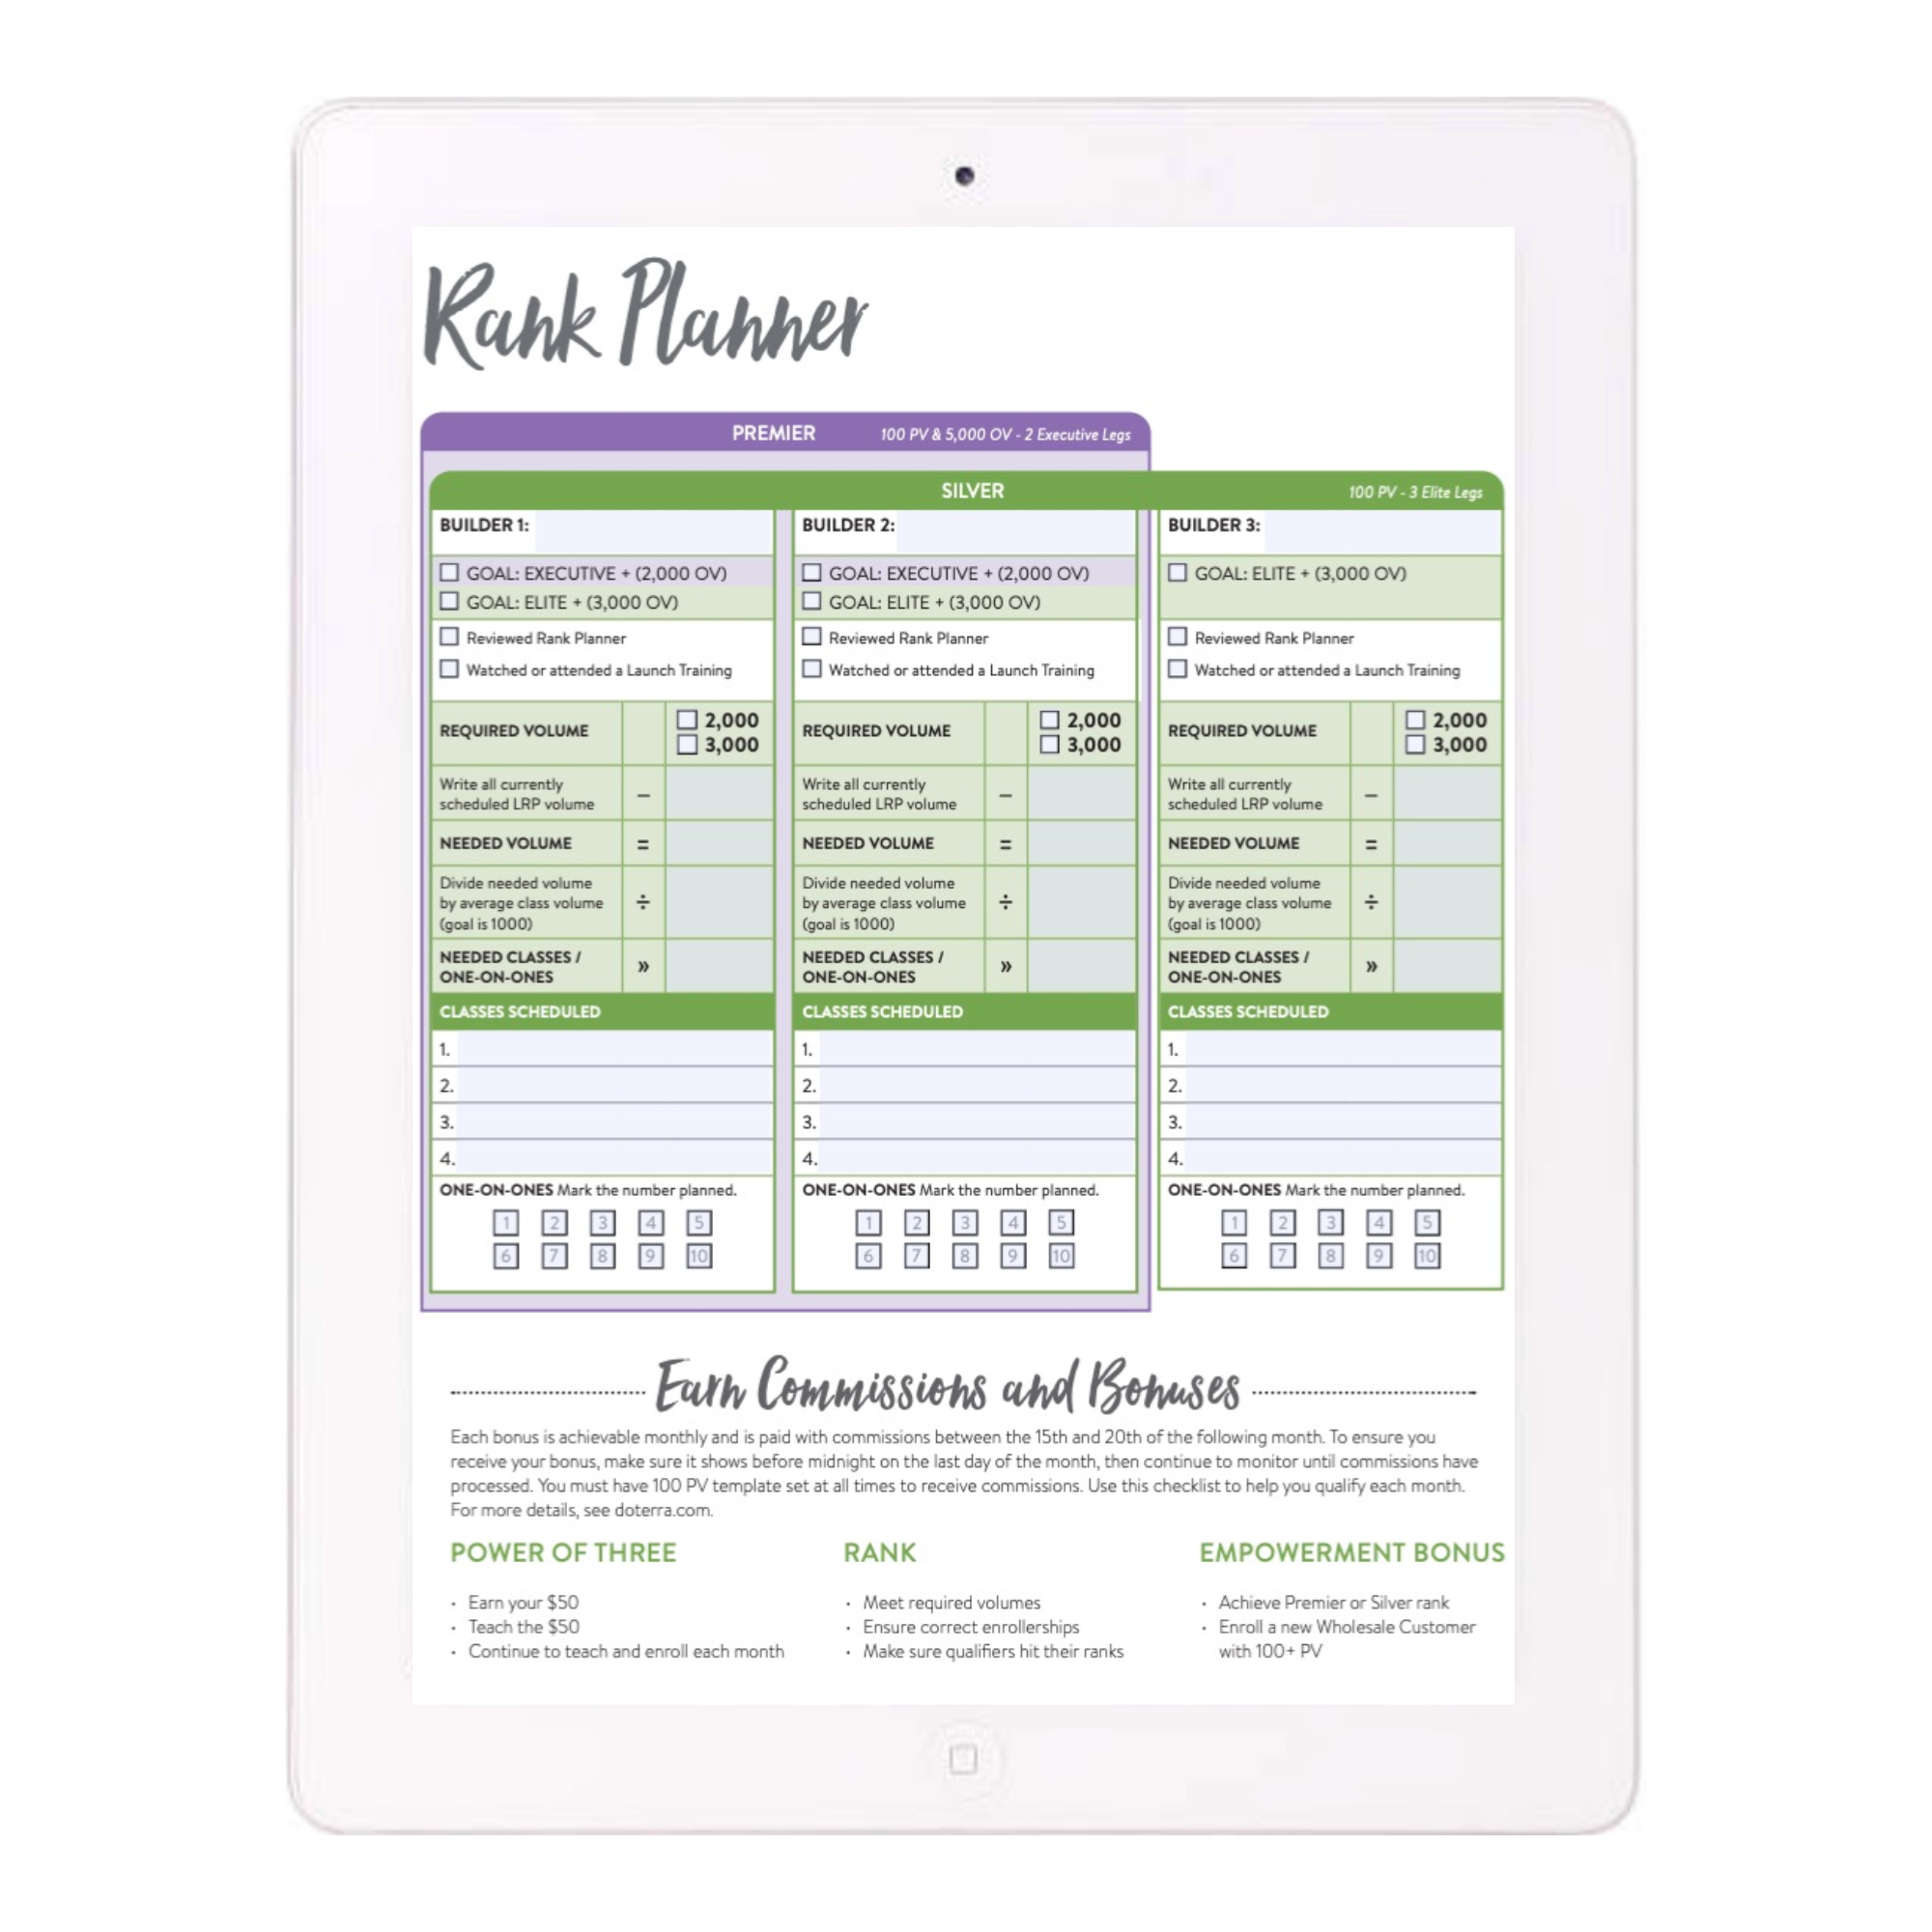 Premier/Silver Rank Planner